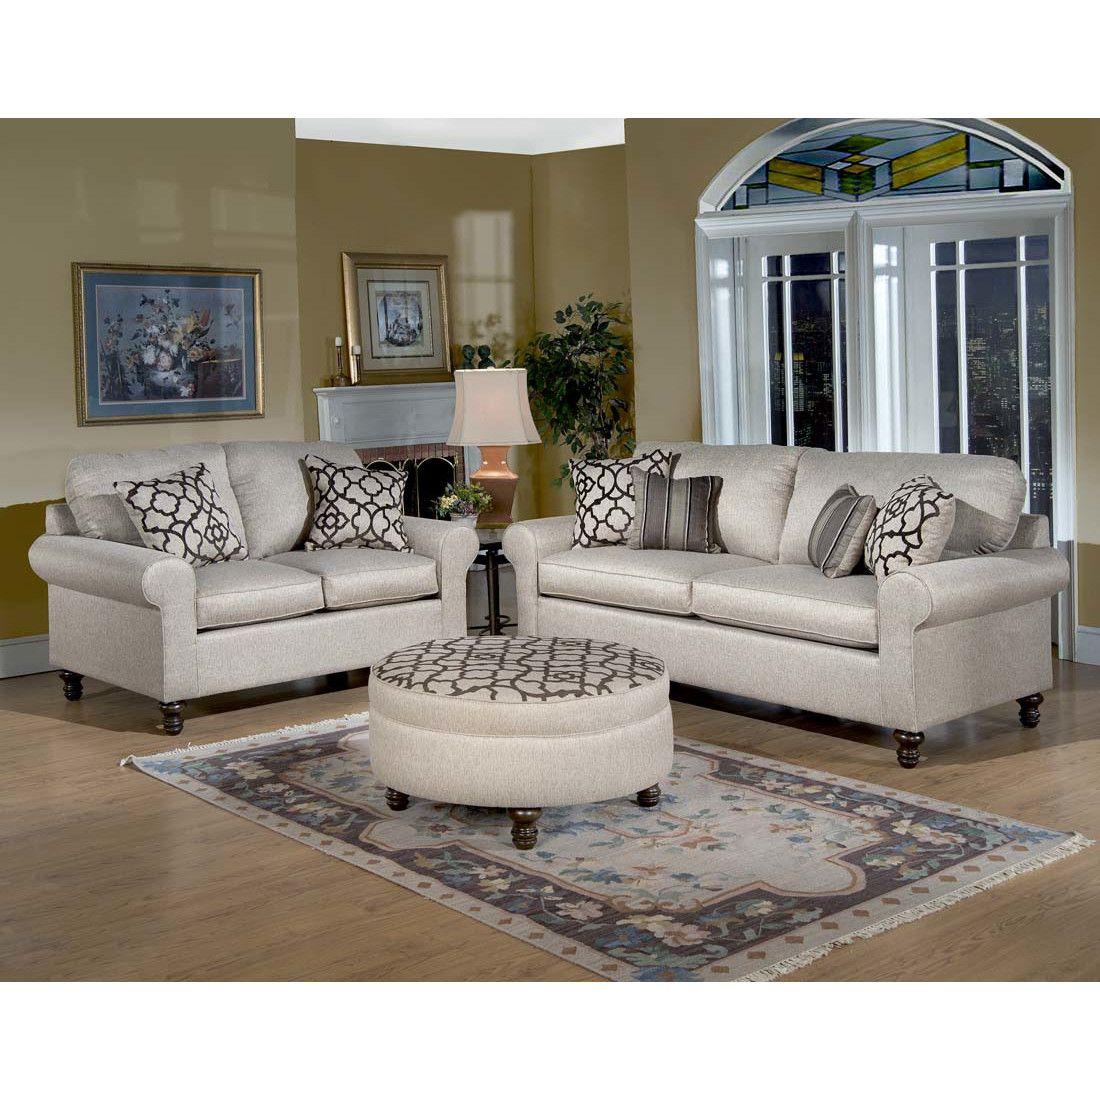 living room furniture wayfair   Wayfair living room furniture, Living room sets furniture ...